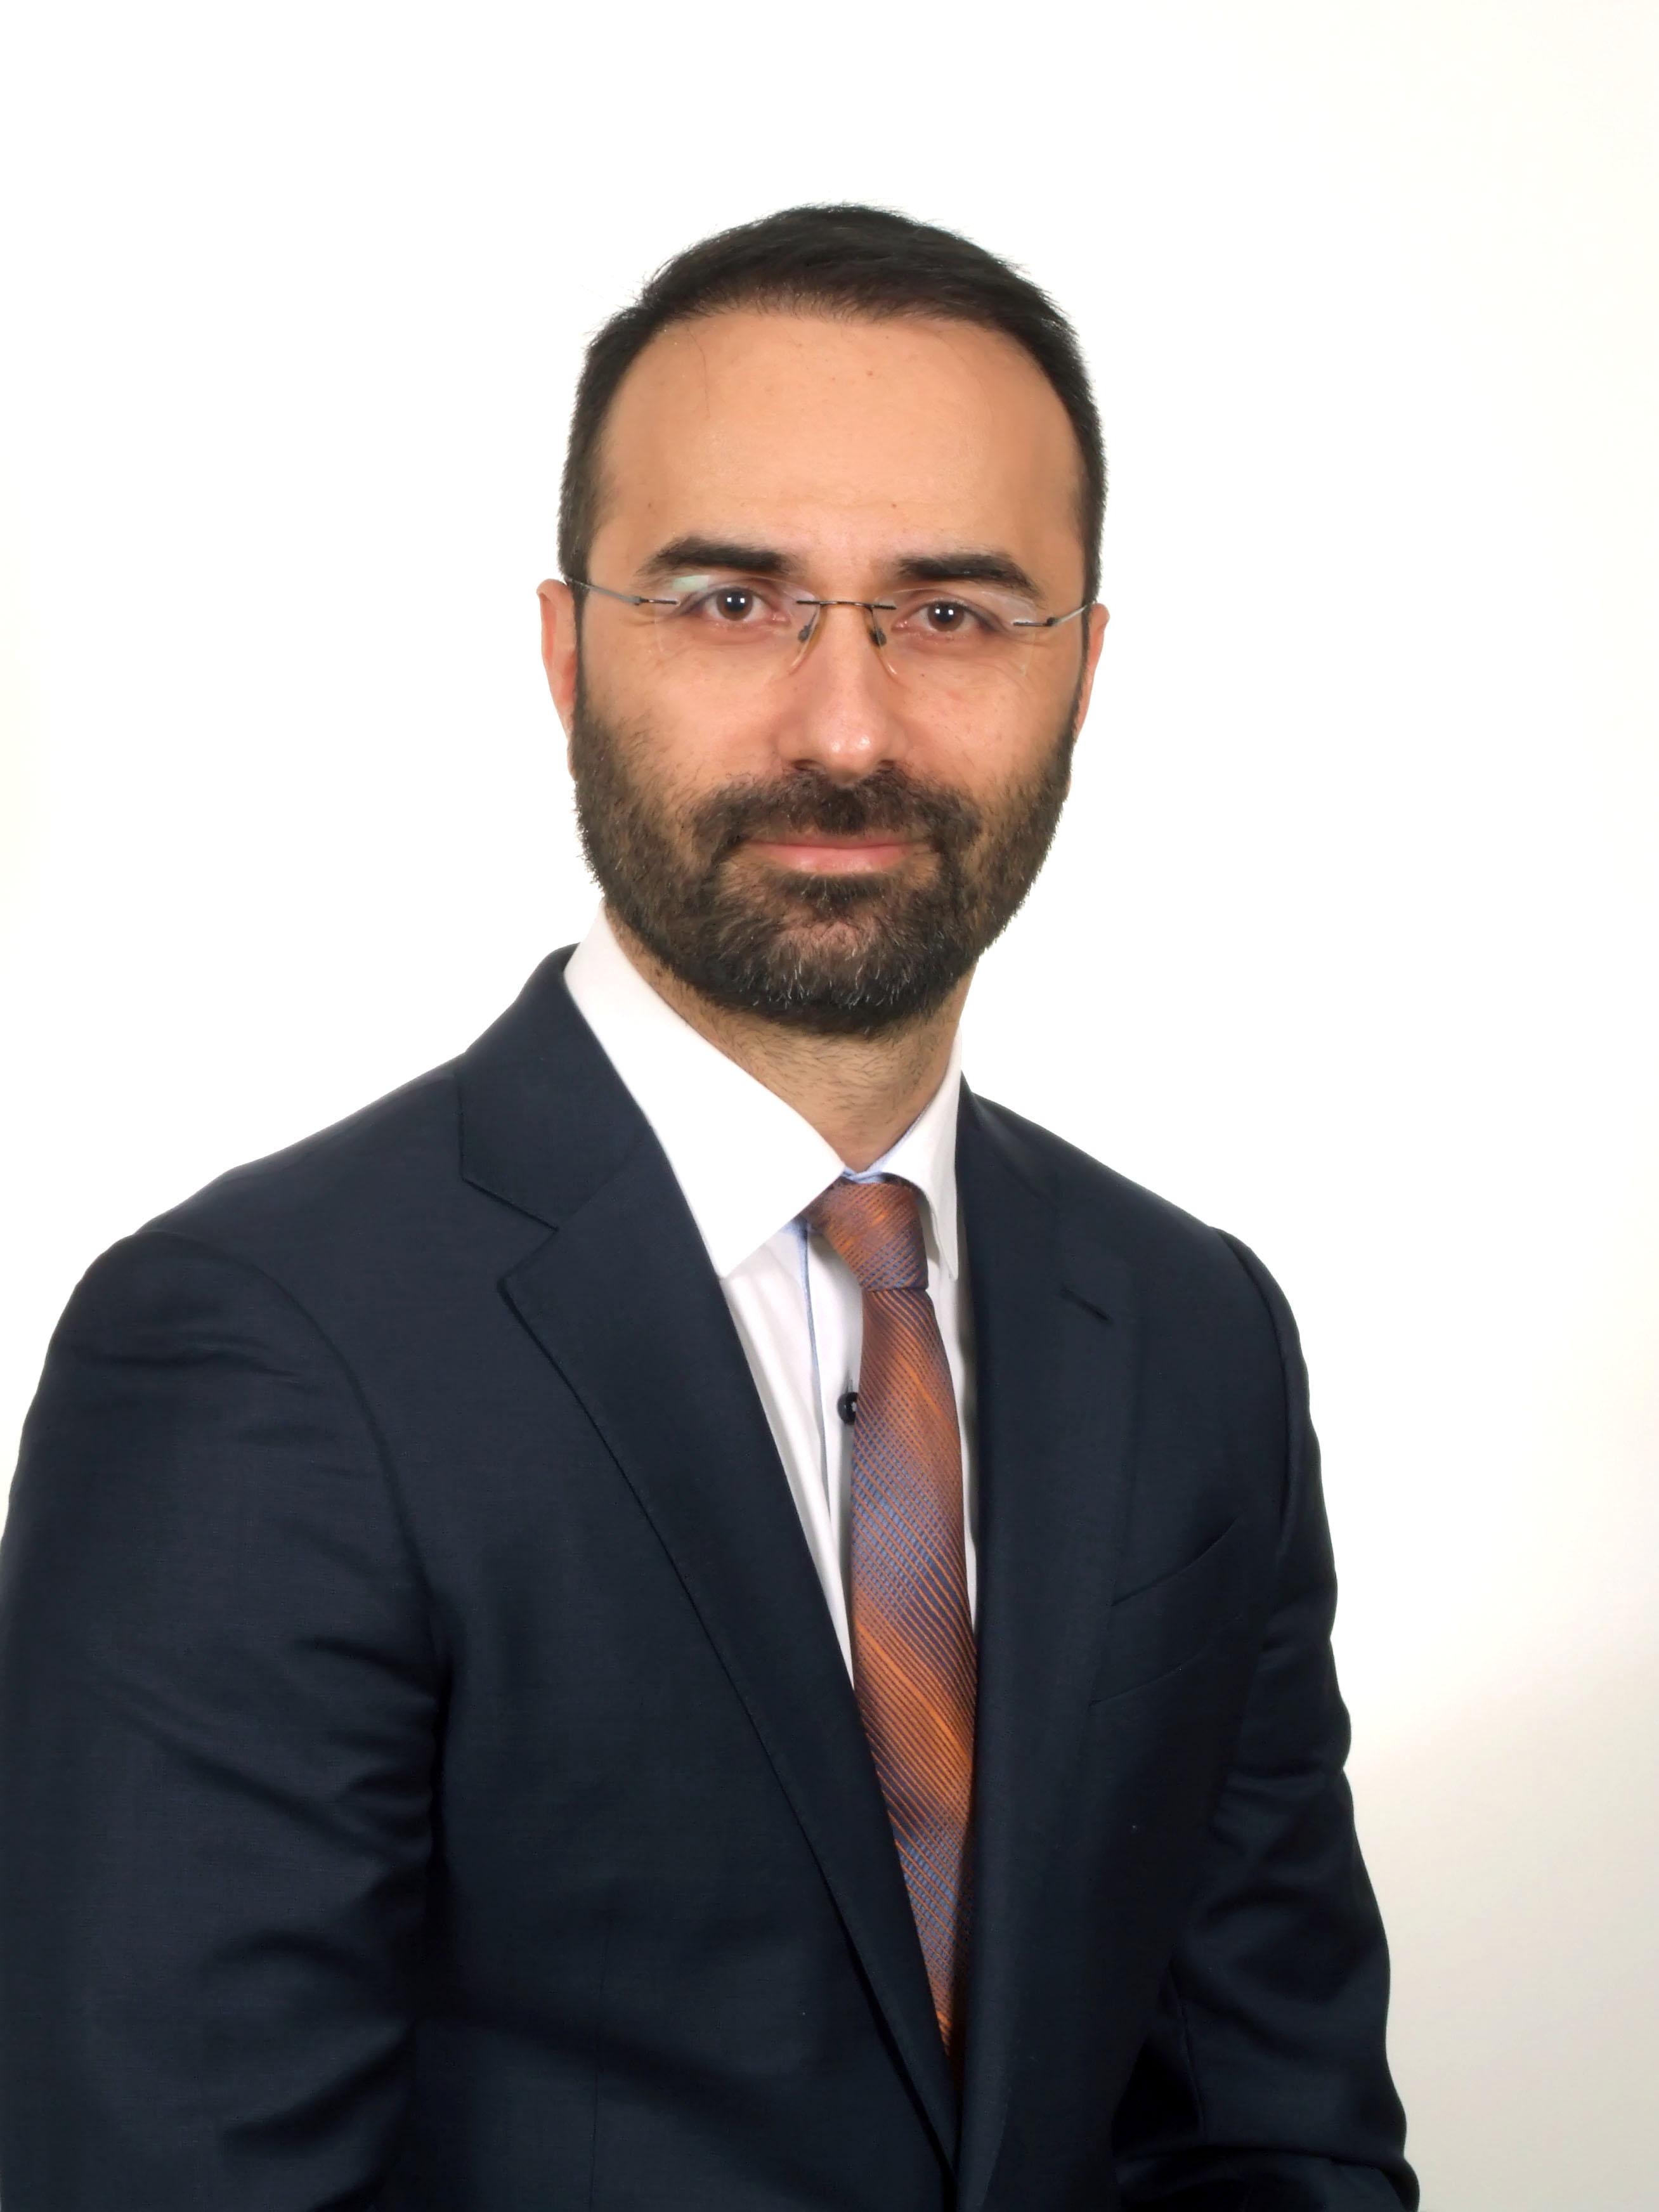 O κ. Παντελής Σταυρινού, Διευθυντής Νευροχειρουργός στο Metropolitan Hospital, επίκουρος Καθηγητής Πανεπιστημίου Κολονίας στη Γερμανία